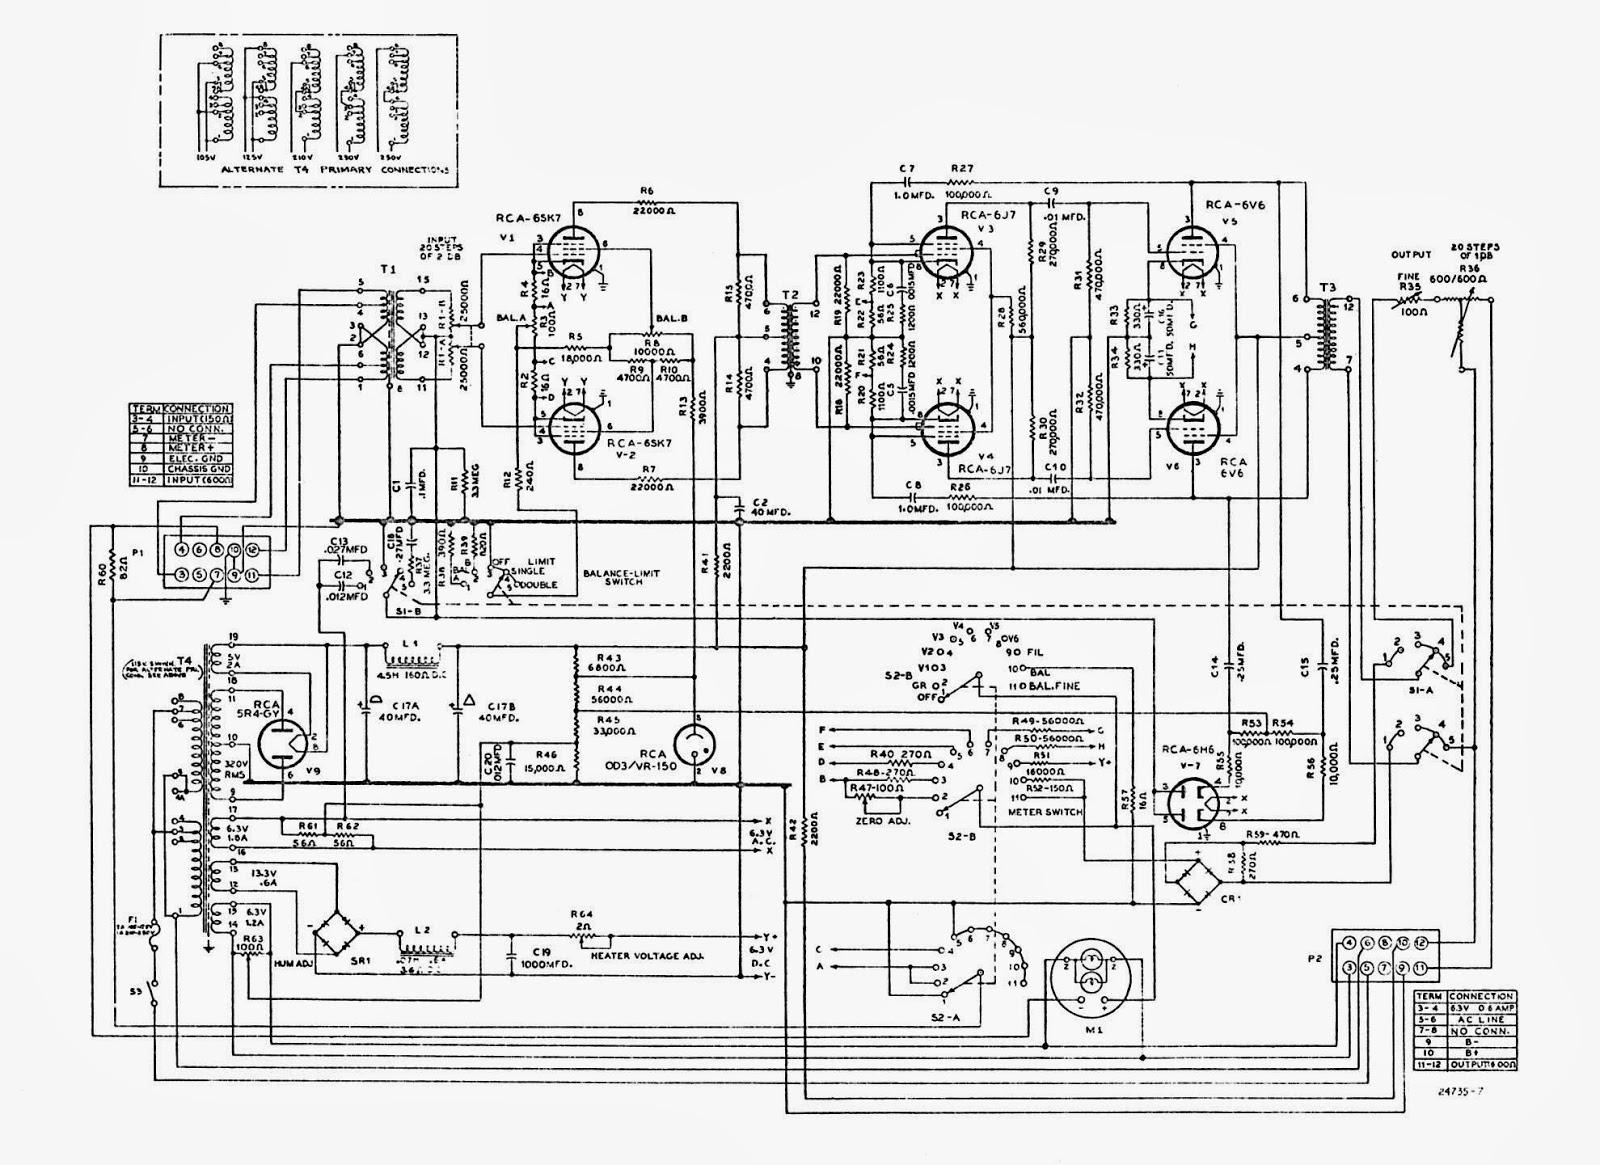 Circuitos compresores de audio: Circuito compresor